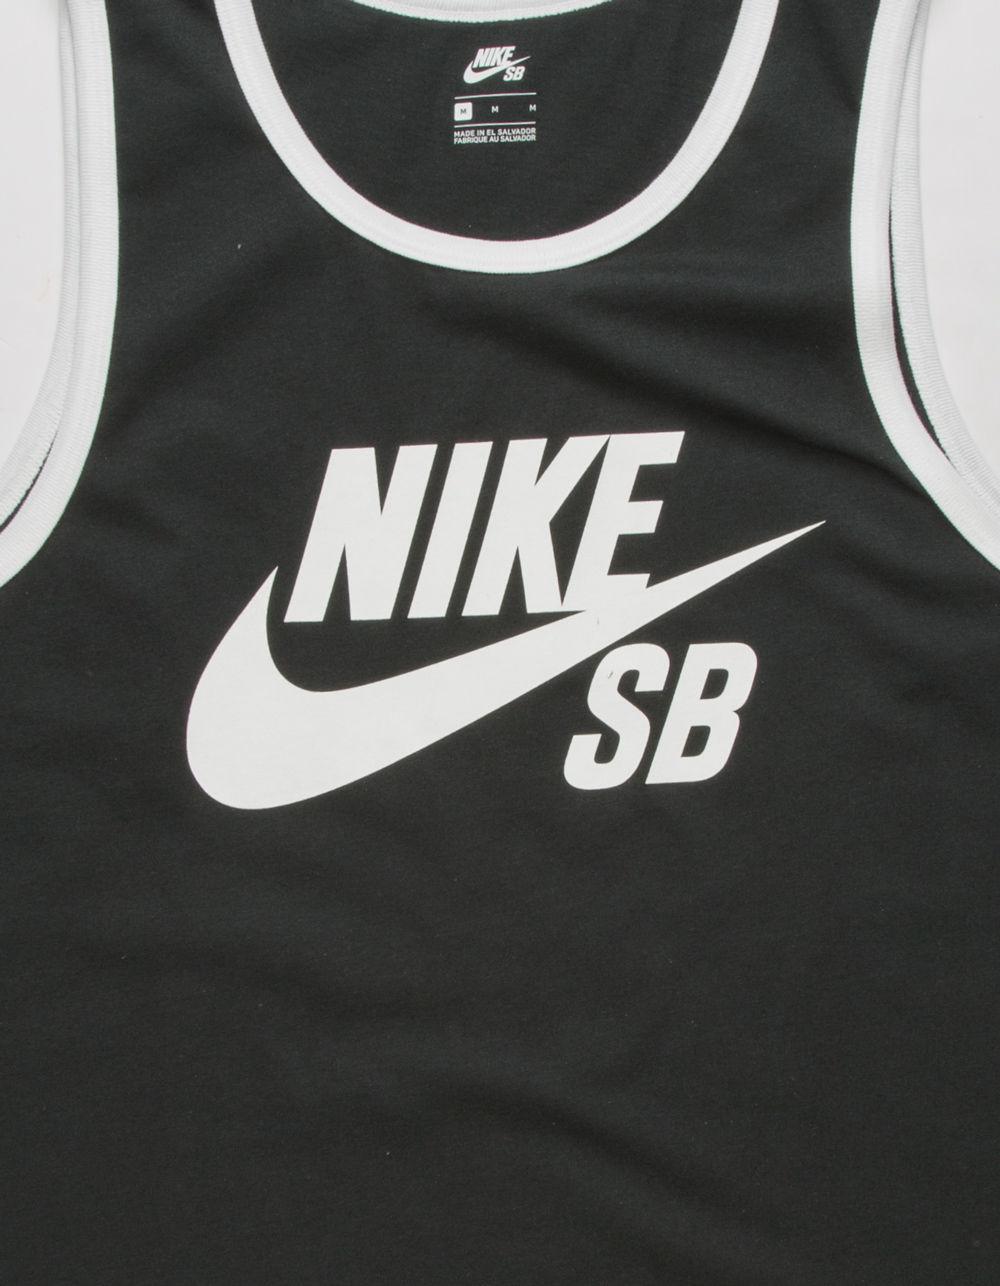 6c984171a07909 Lyst - Nike Mens Ringer Tank Top in Black for Men